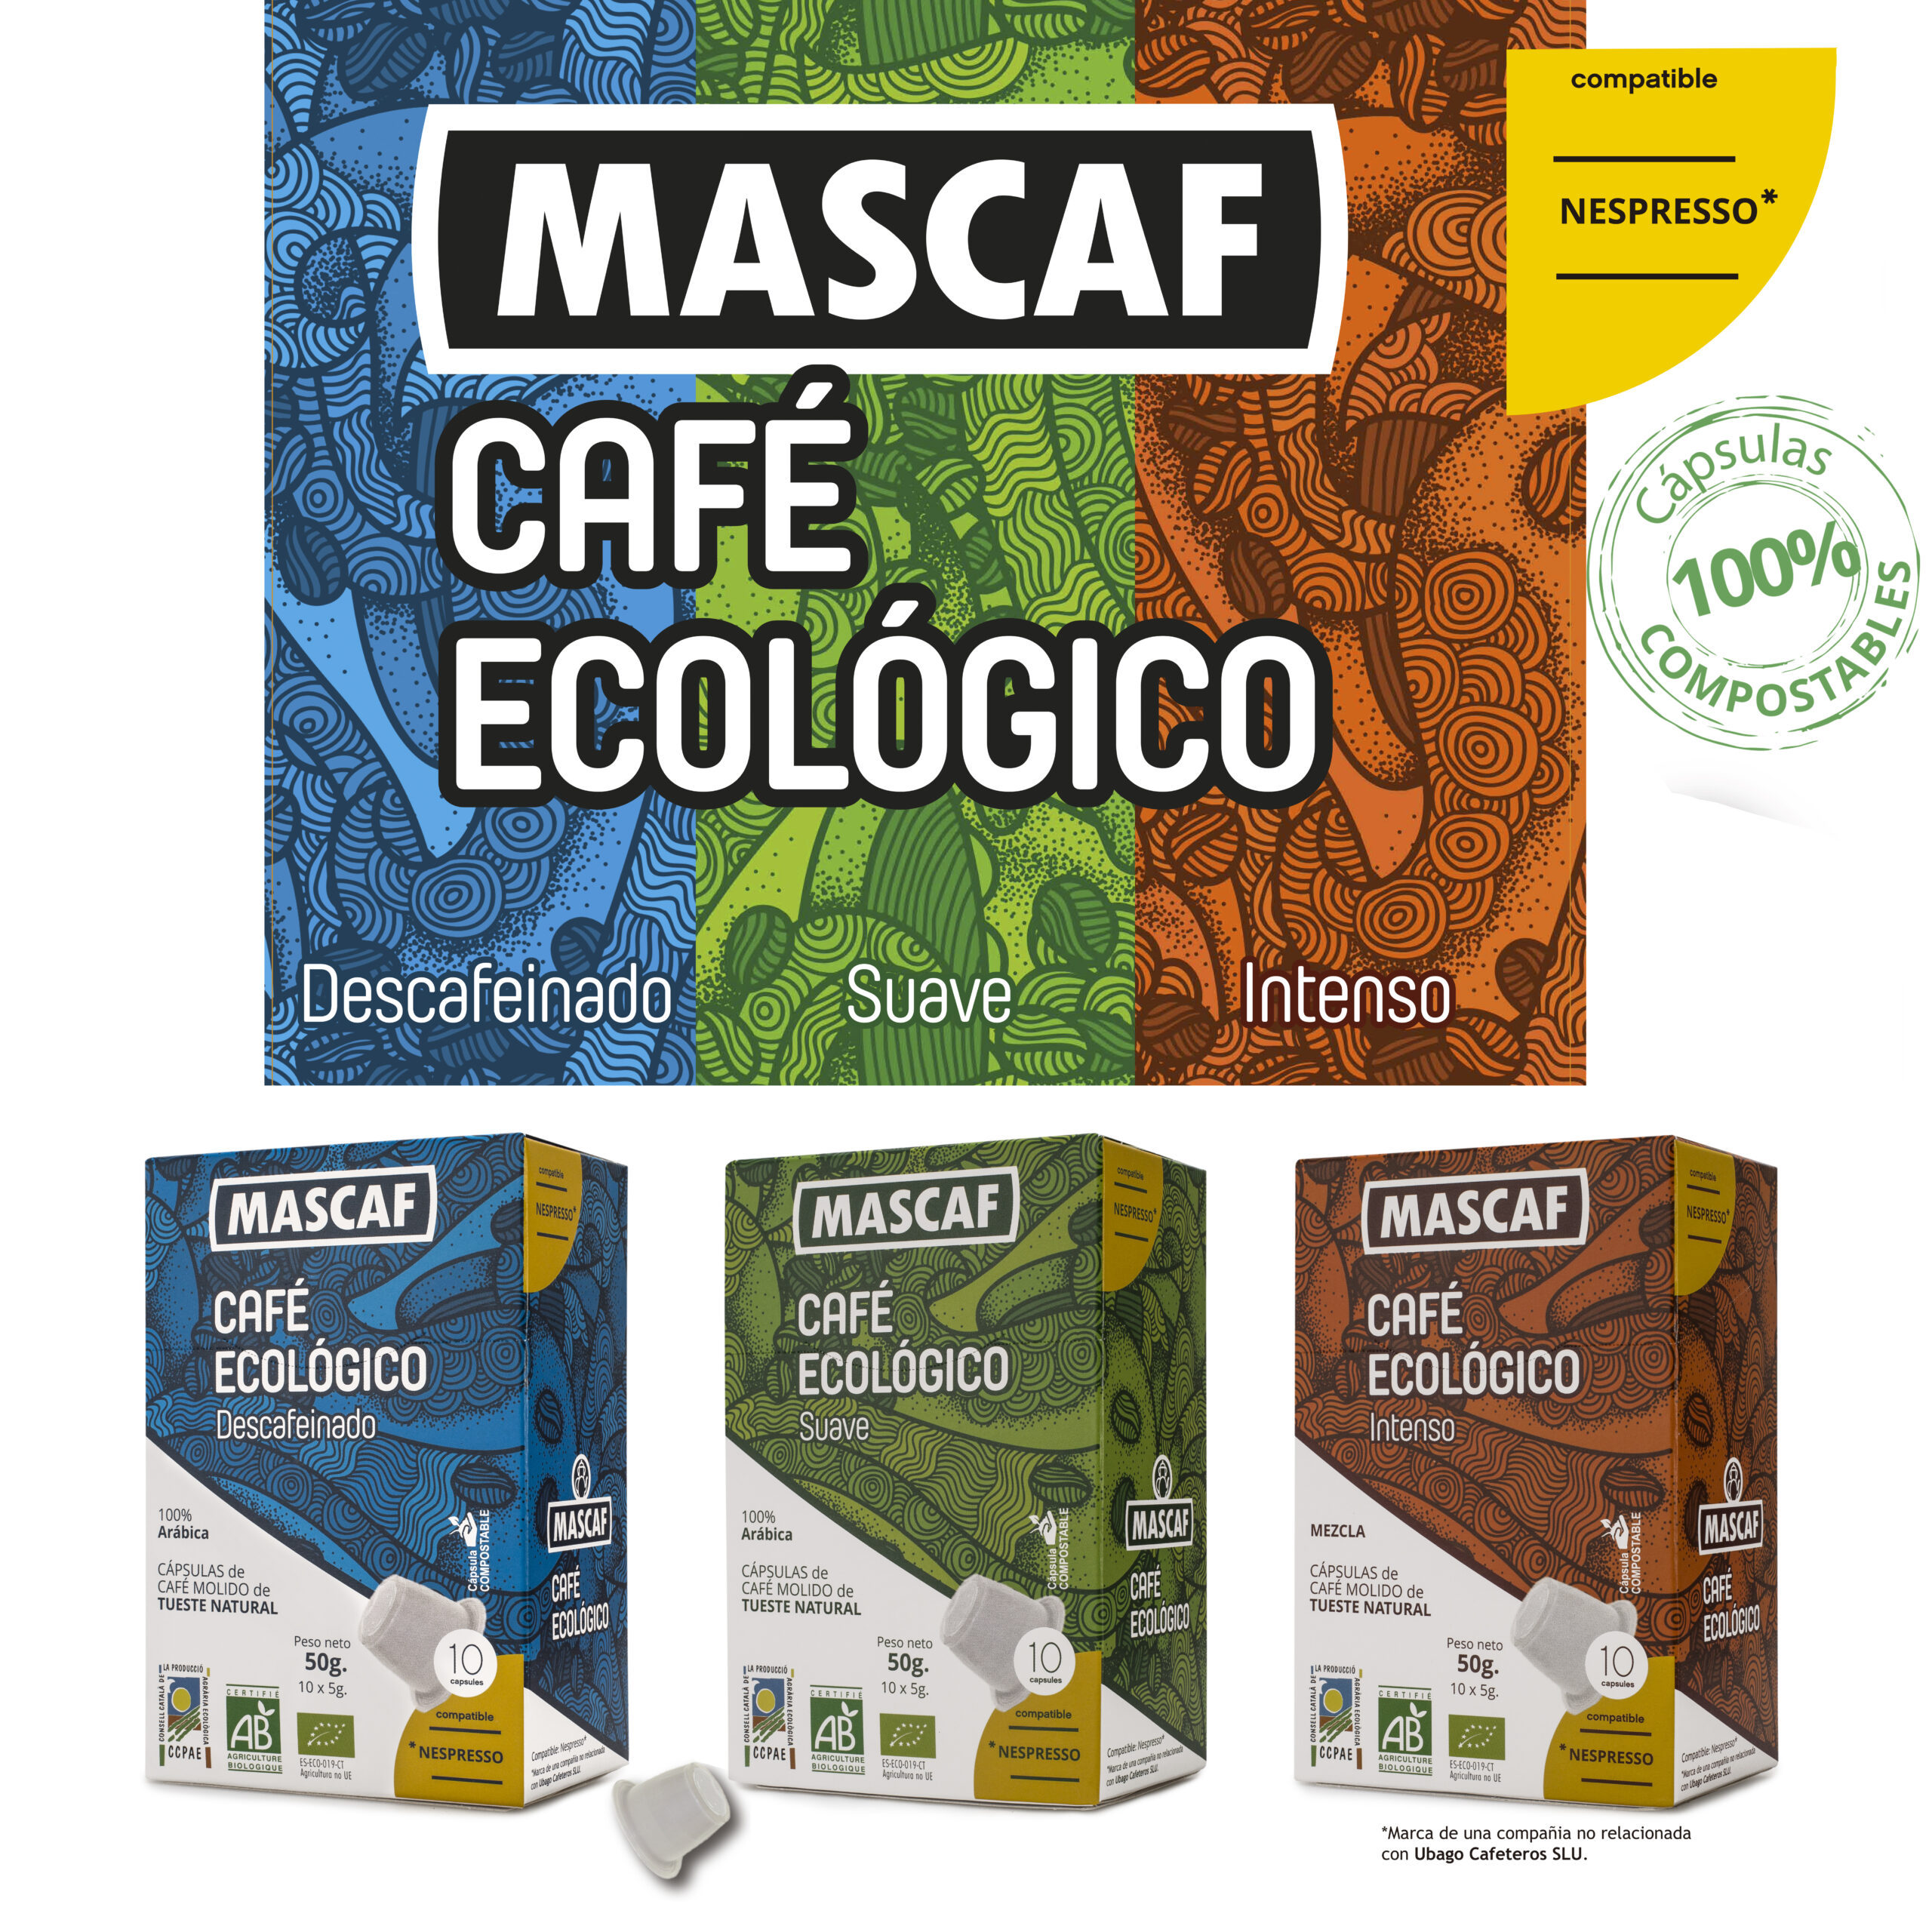 Cápsulas compostables compatibles Nespresso